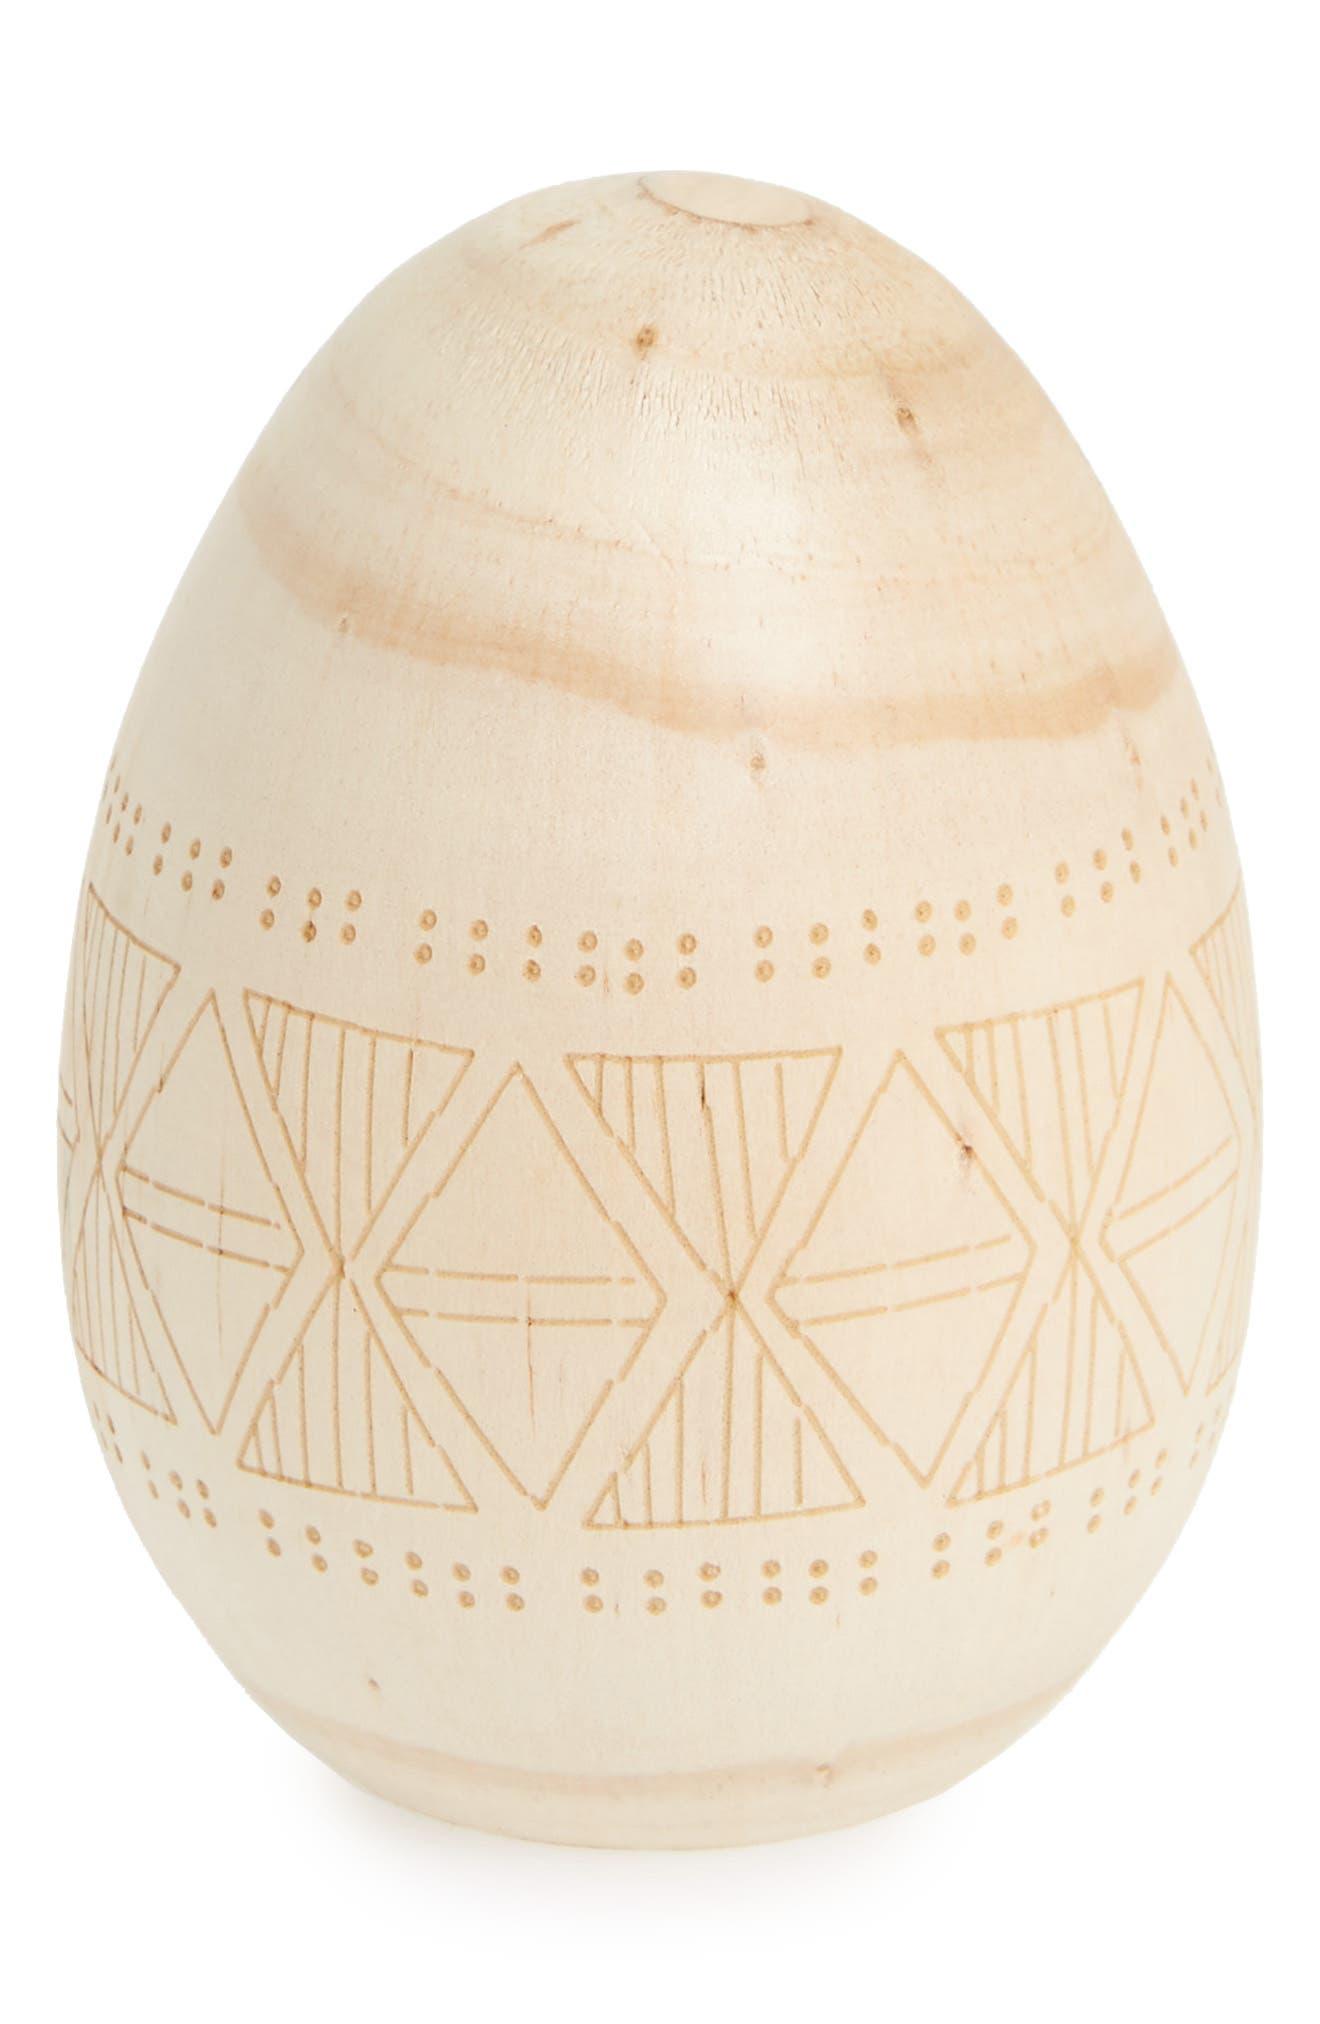 Loco Egg Carved Wooden Egg,                         Main,                         color, 200